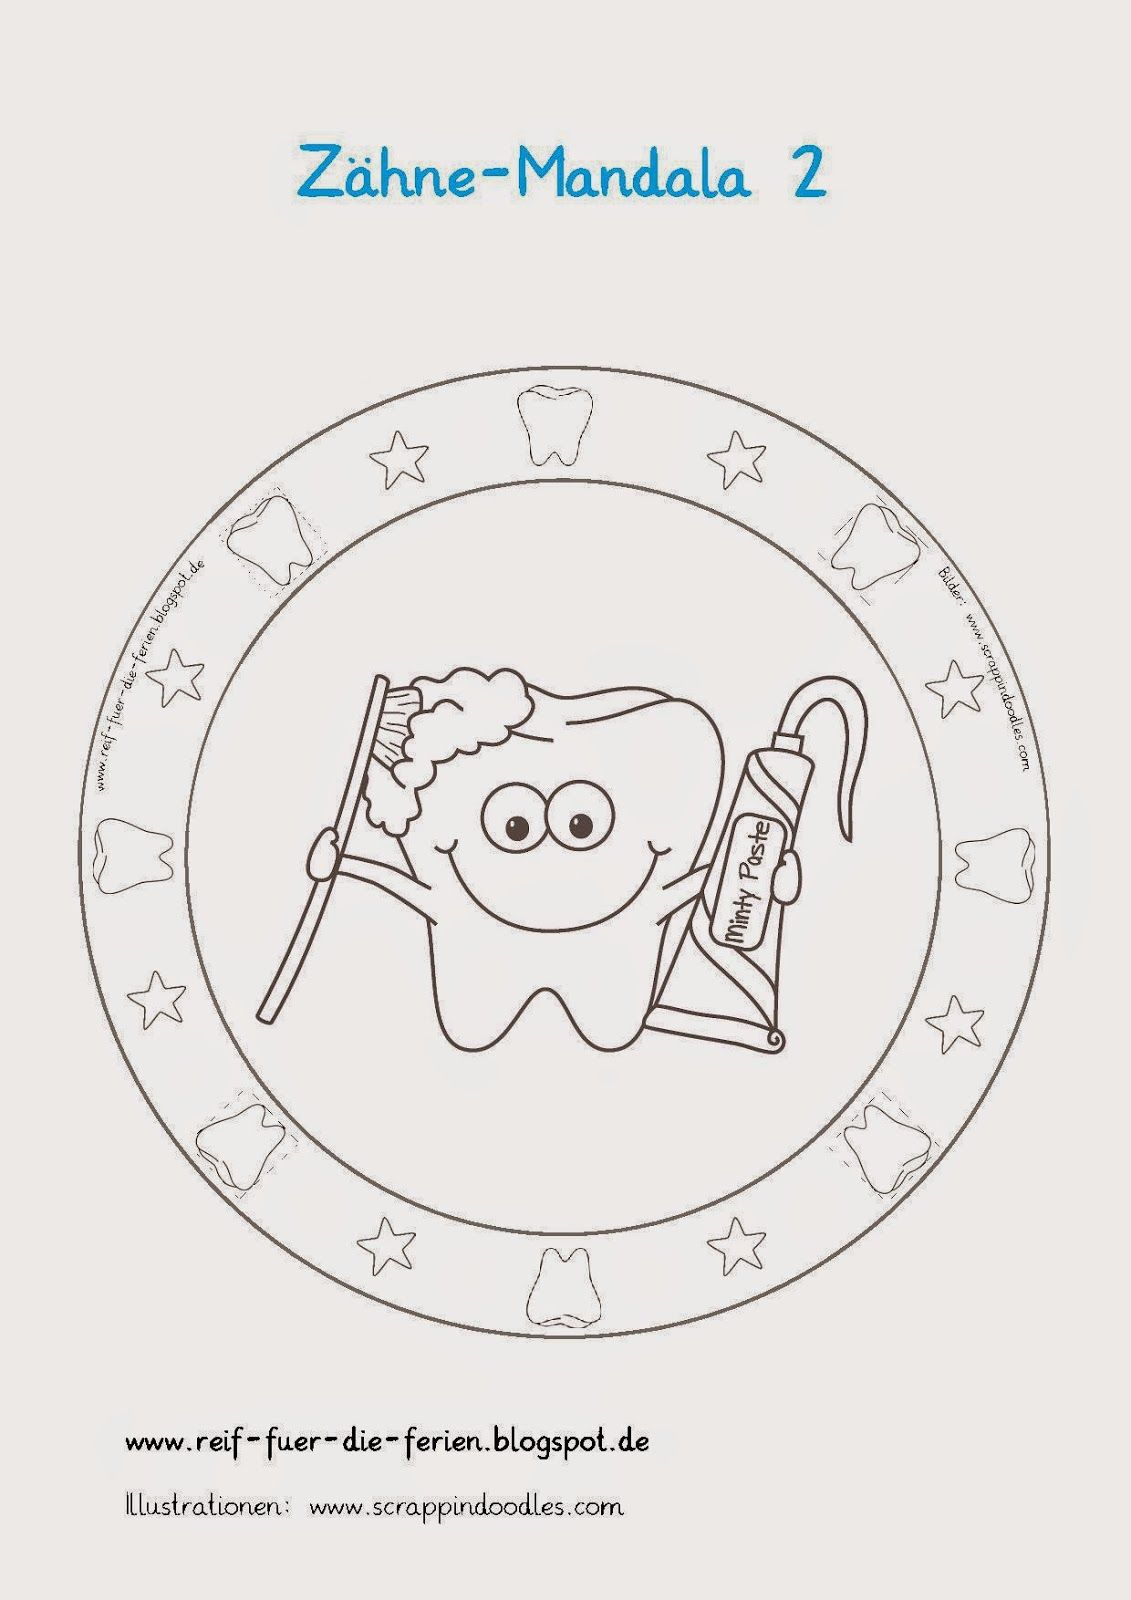 Zähne-Mandalas | Material 1. Klasse | Pinterest | Kindergarten ...